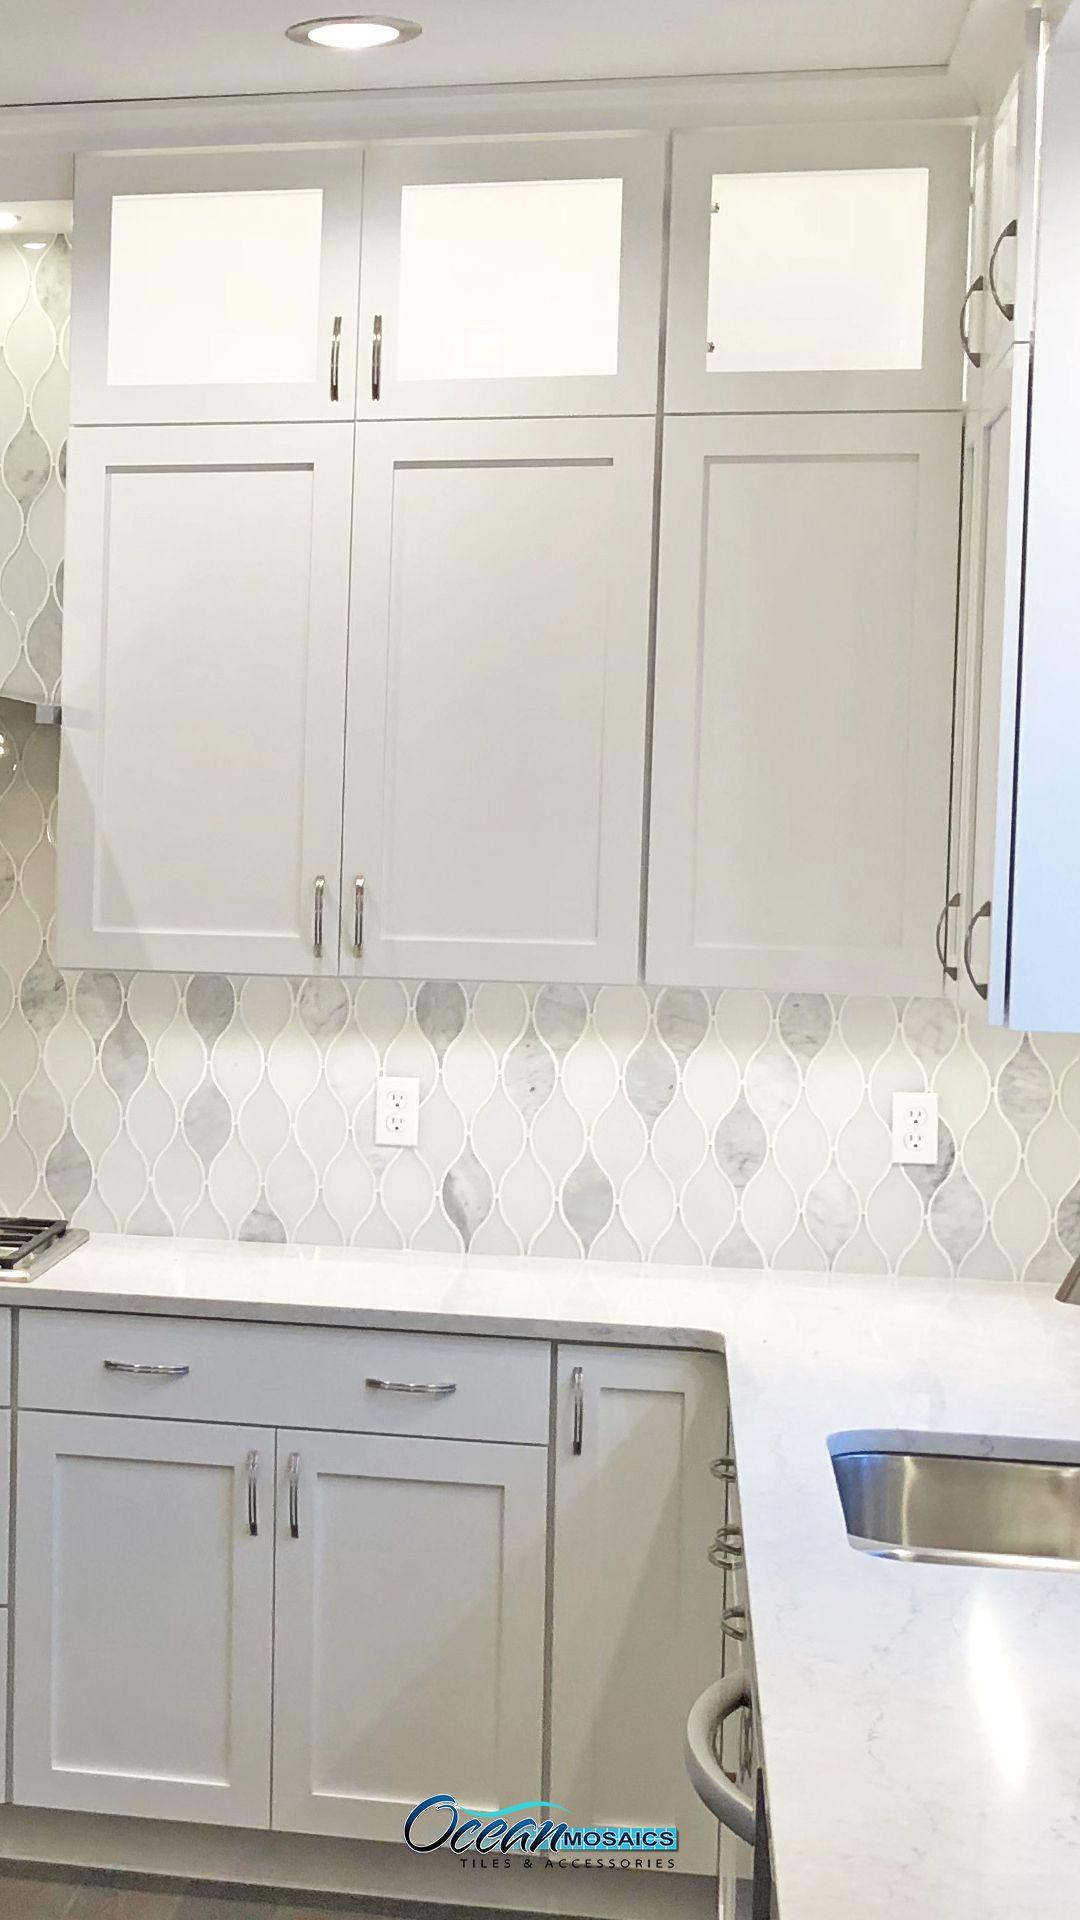 Chandelier Carrara Teardrop Glass Mosaic Tile Kitchen Backsplash